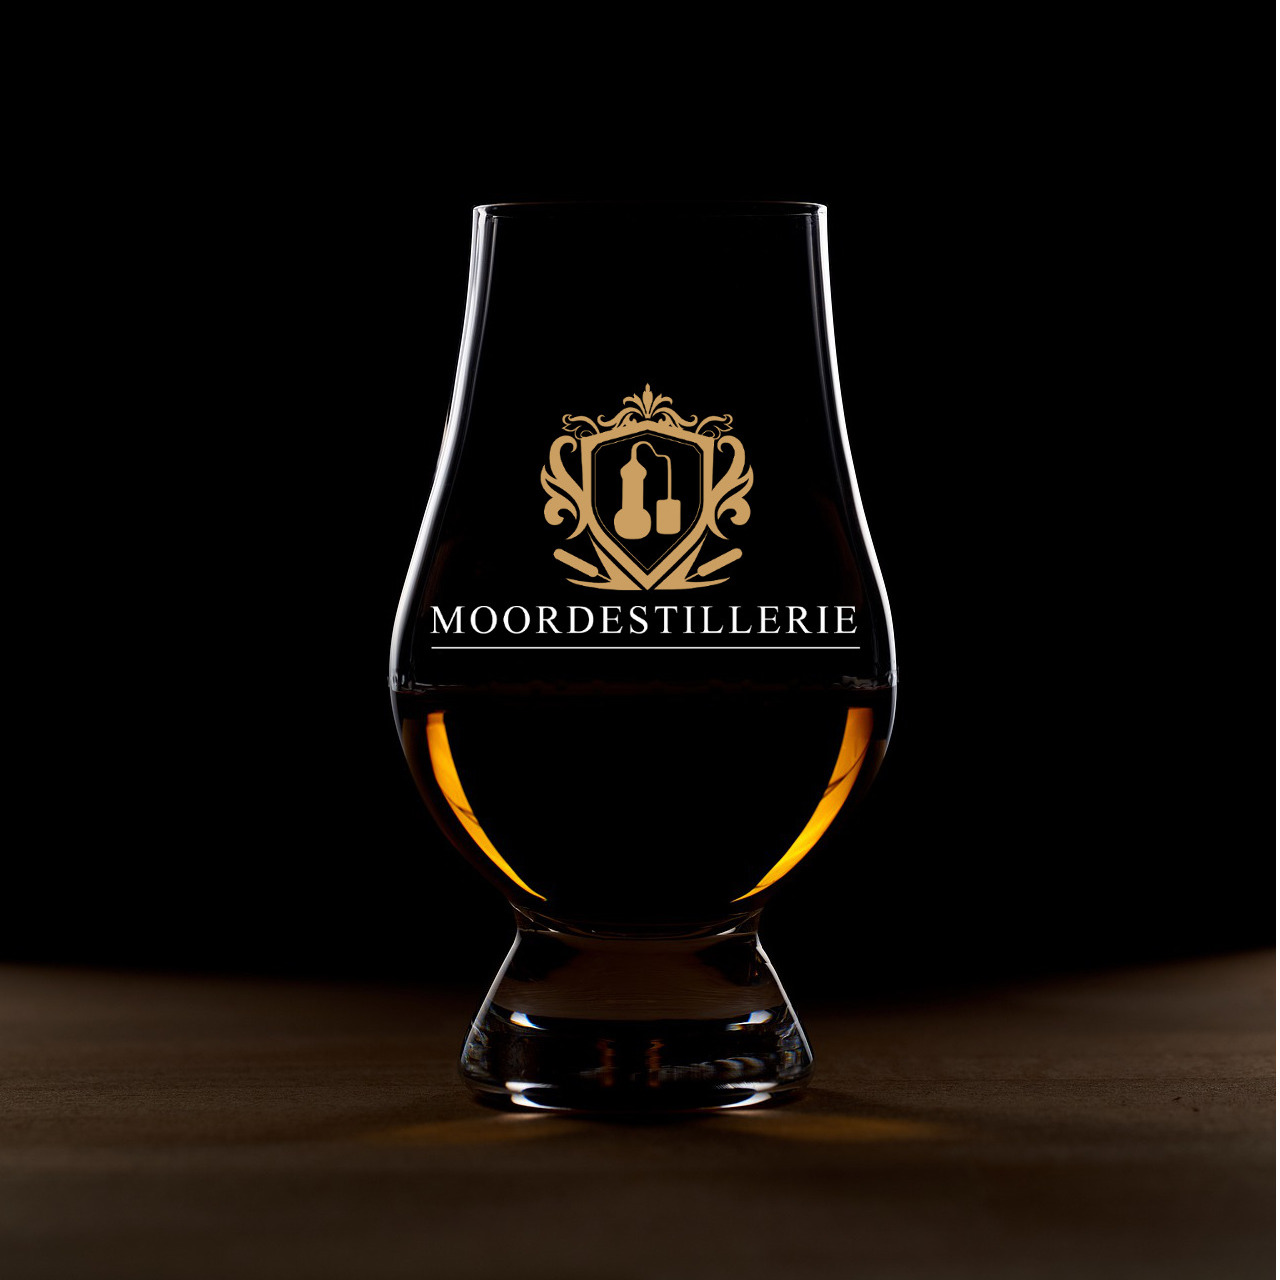 MOORDESTILLERIE Gin Tasting Rosenheim und AlpenSPIRIT Tasting Touren 1280x1280